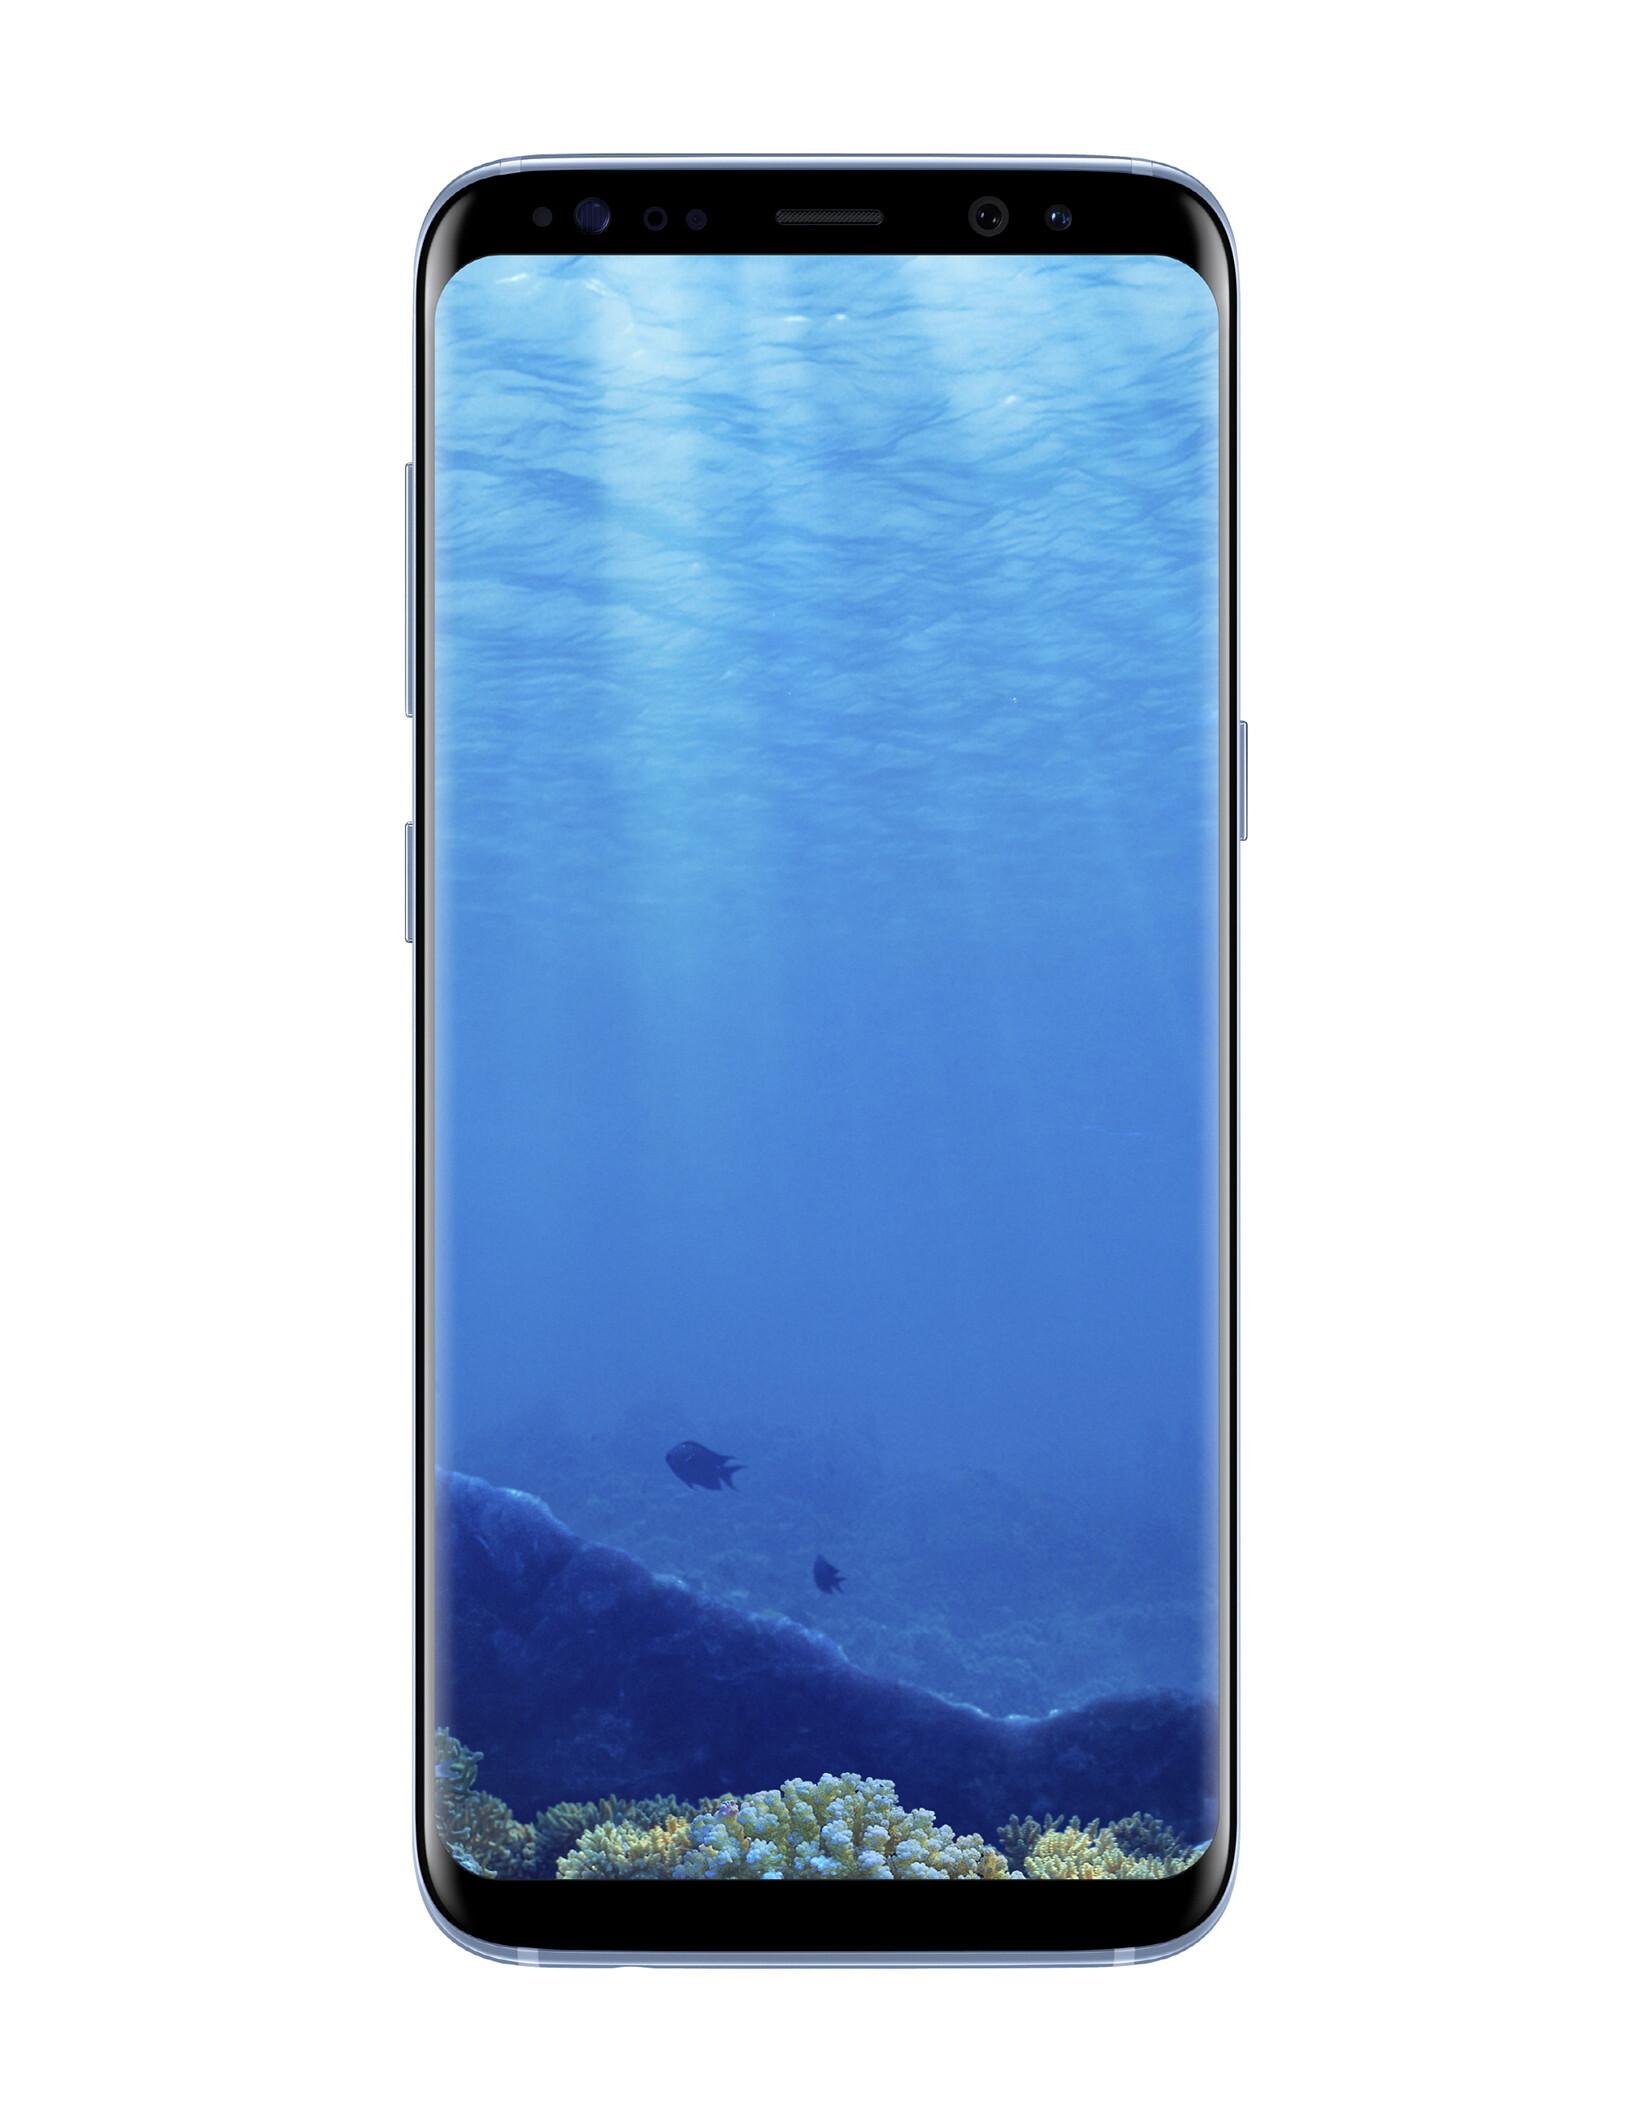 Samsung Galaxy S8 specs - PhoneArena